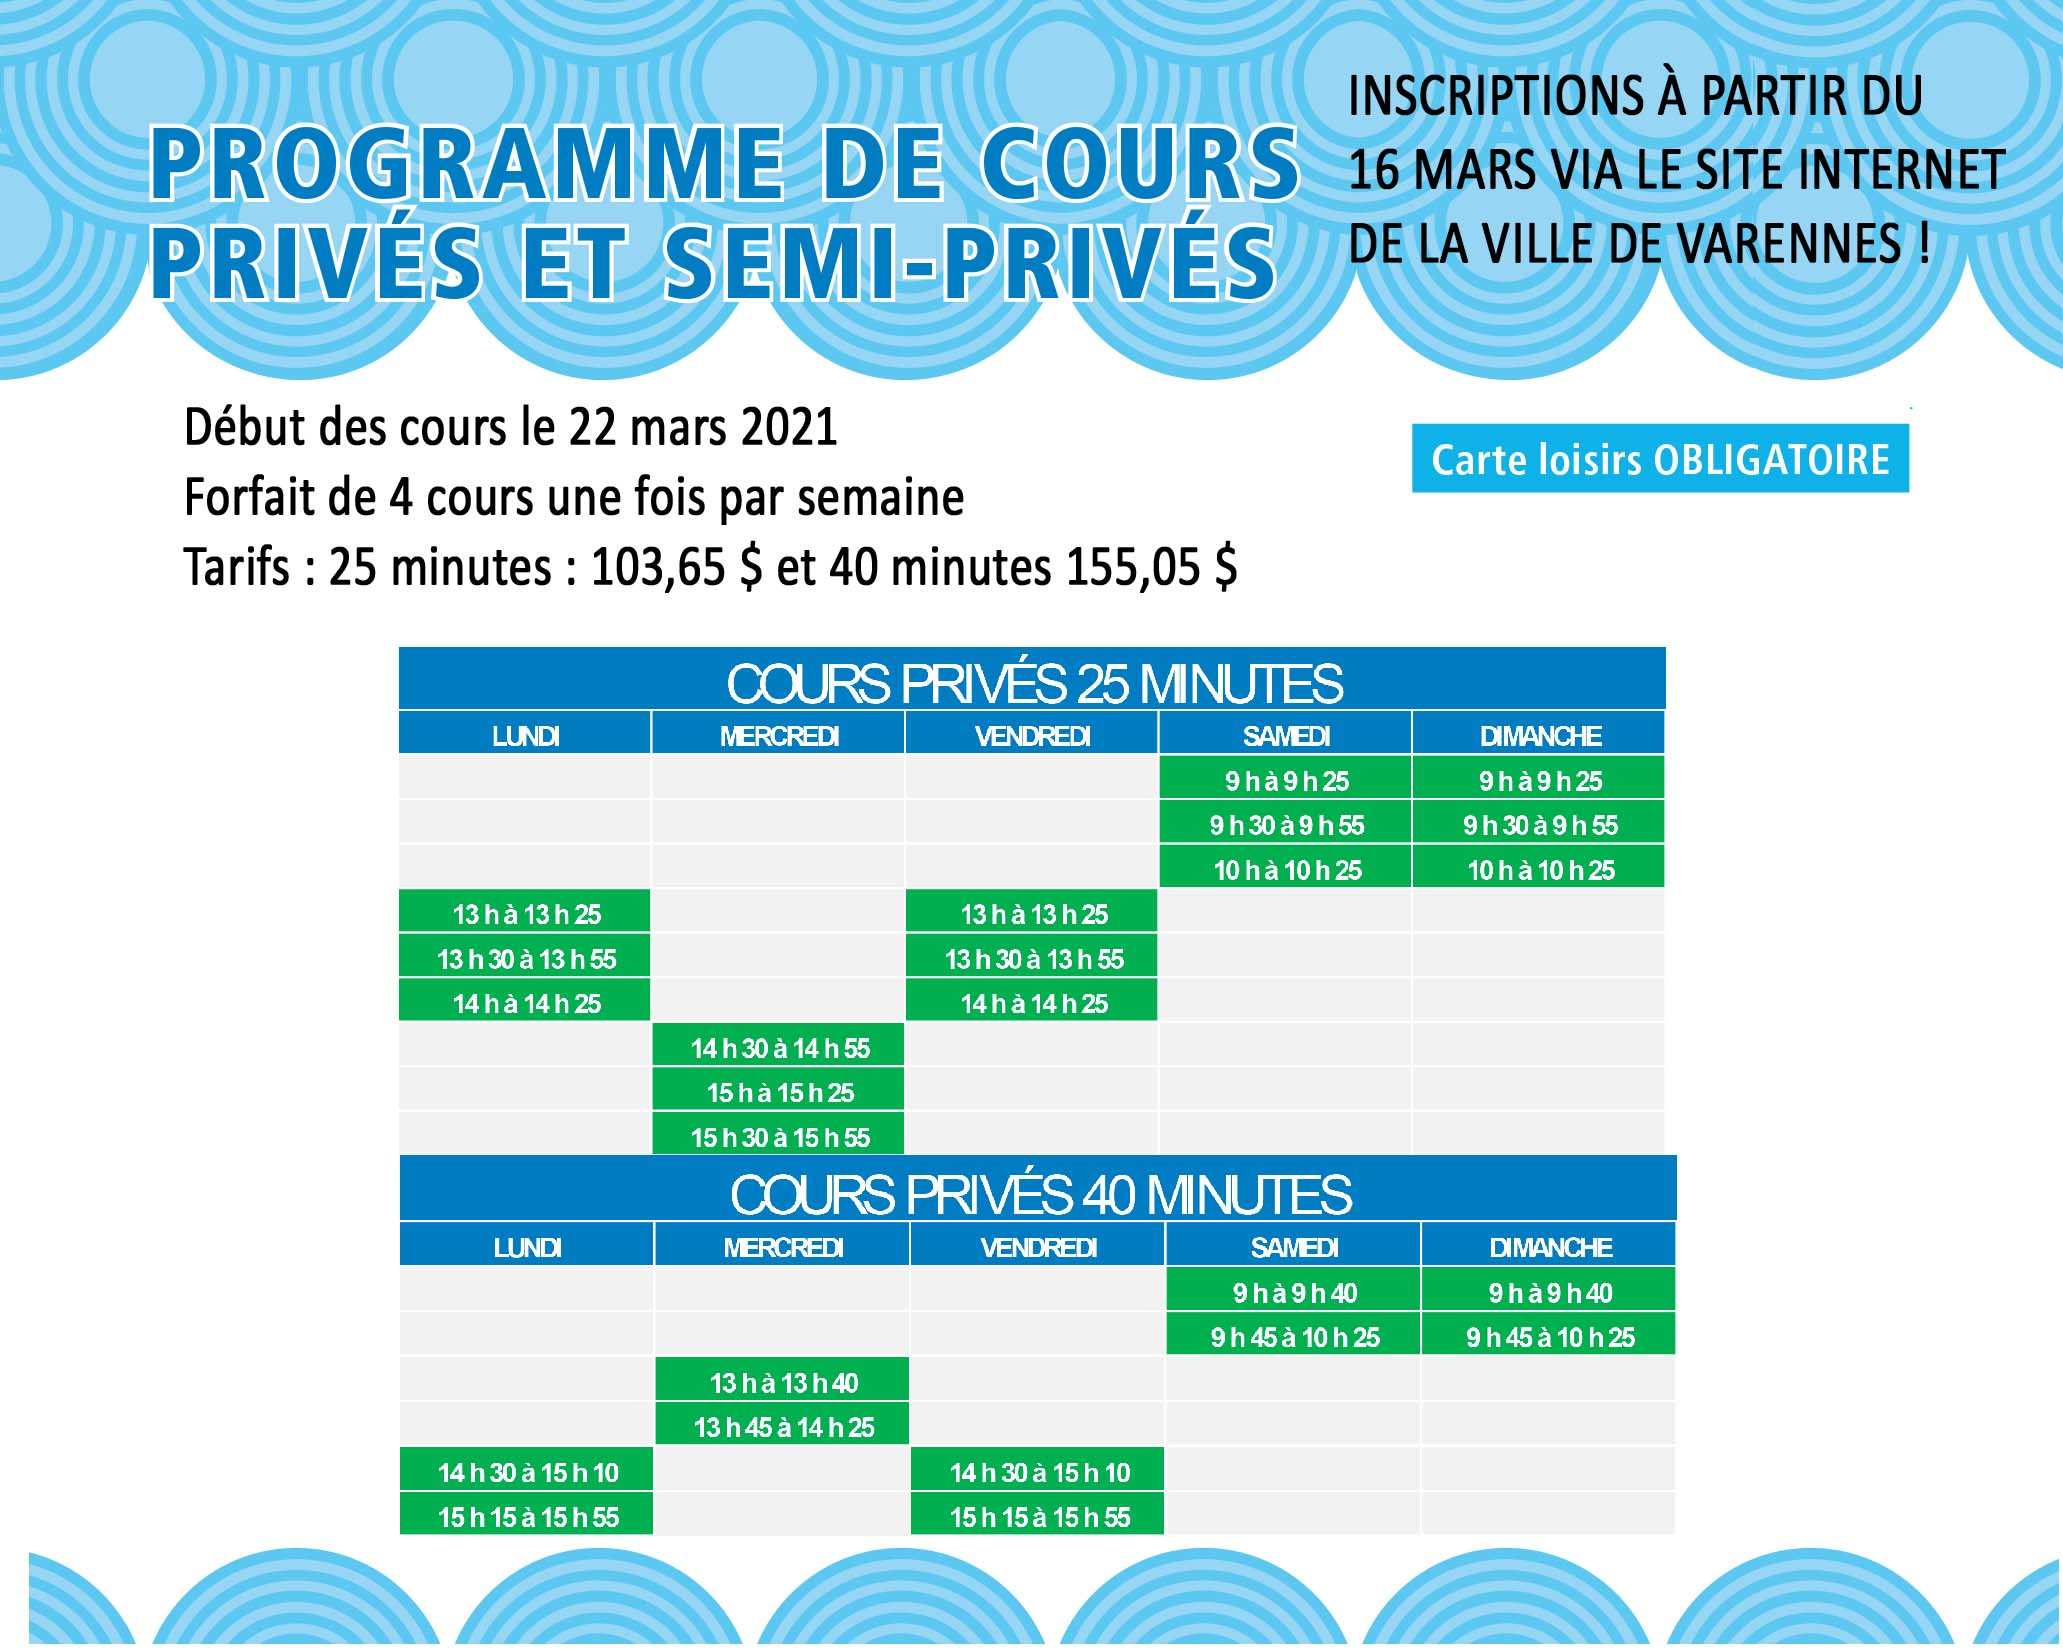 2021-03-15_cours_prives.jpg (350 KB)